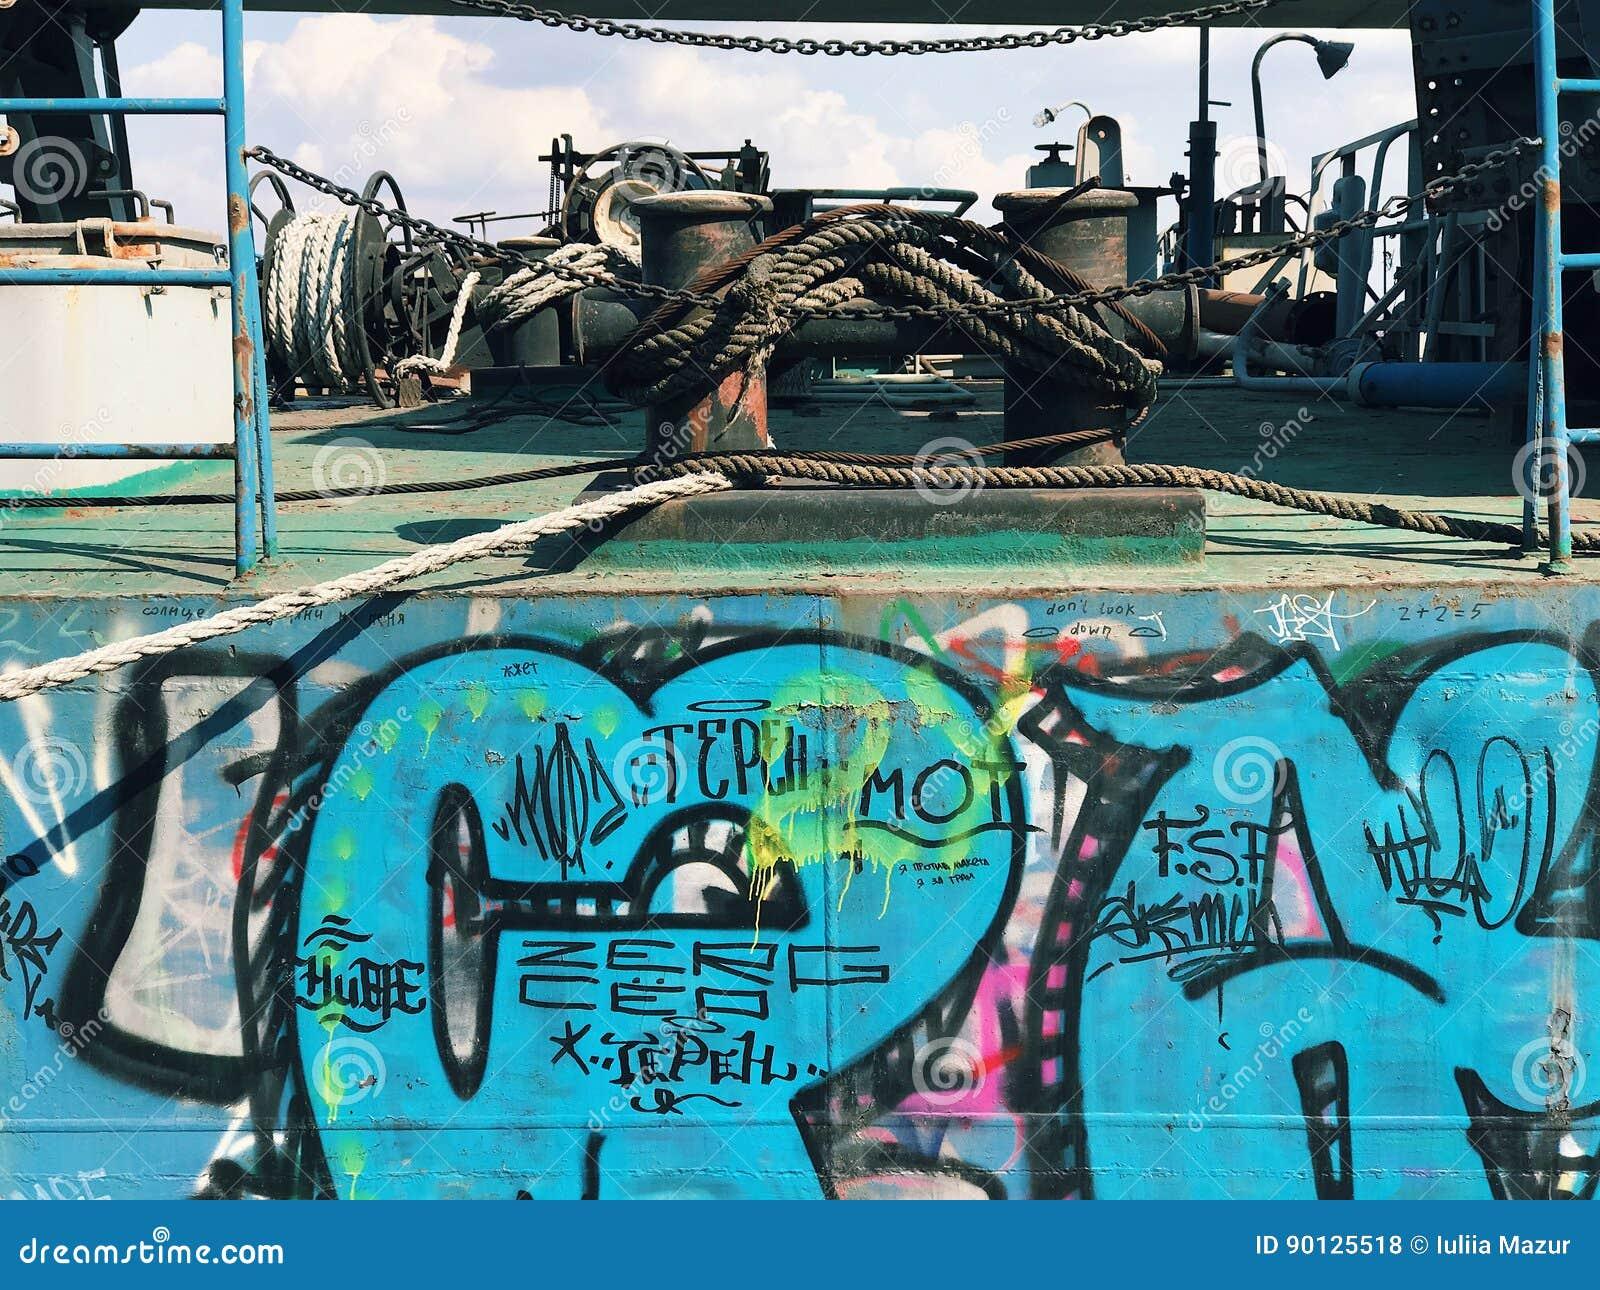 Download 4600 Koleksi Background Art Urban HD Terbaik